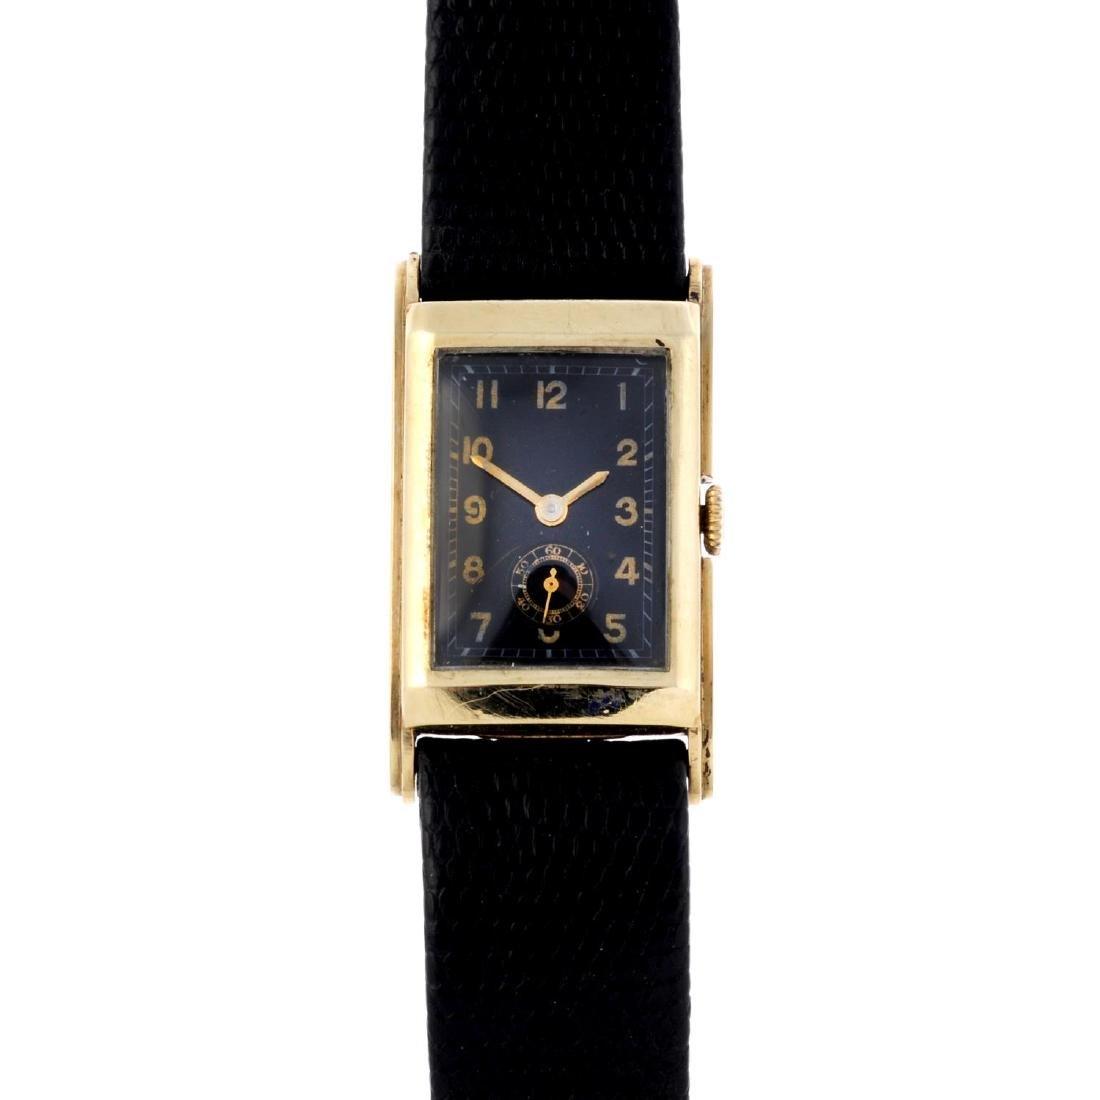 A gentleman's wrist watch. Yellow metal case, stamped